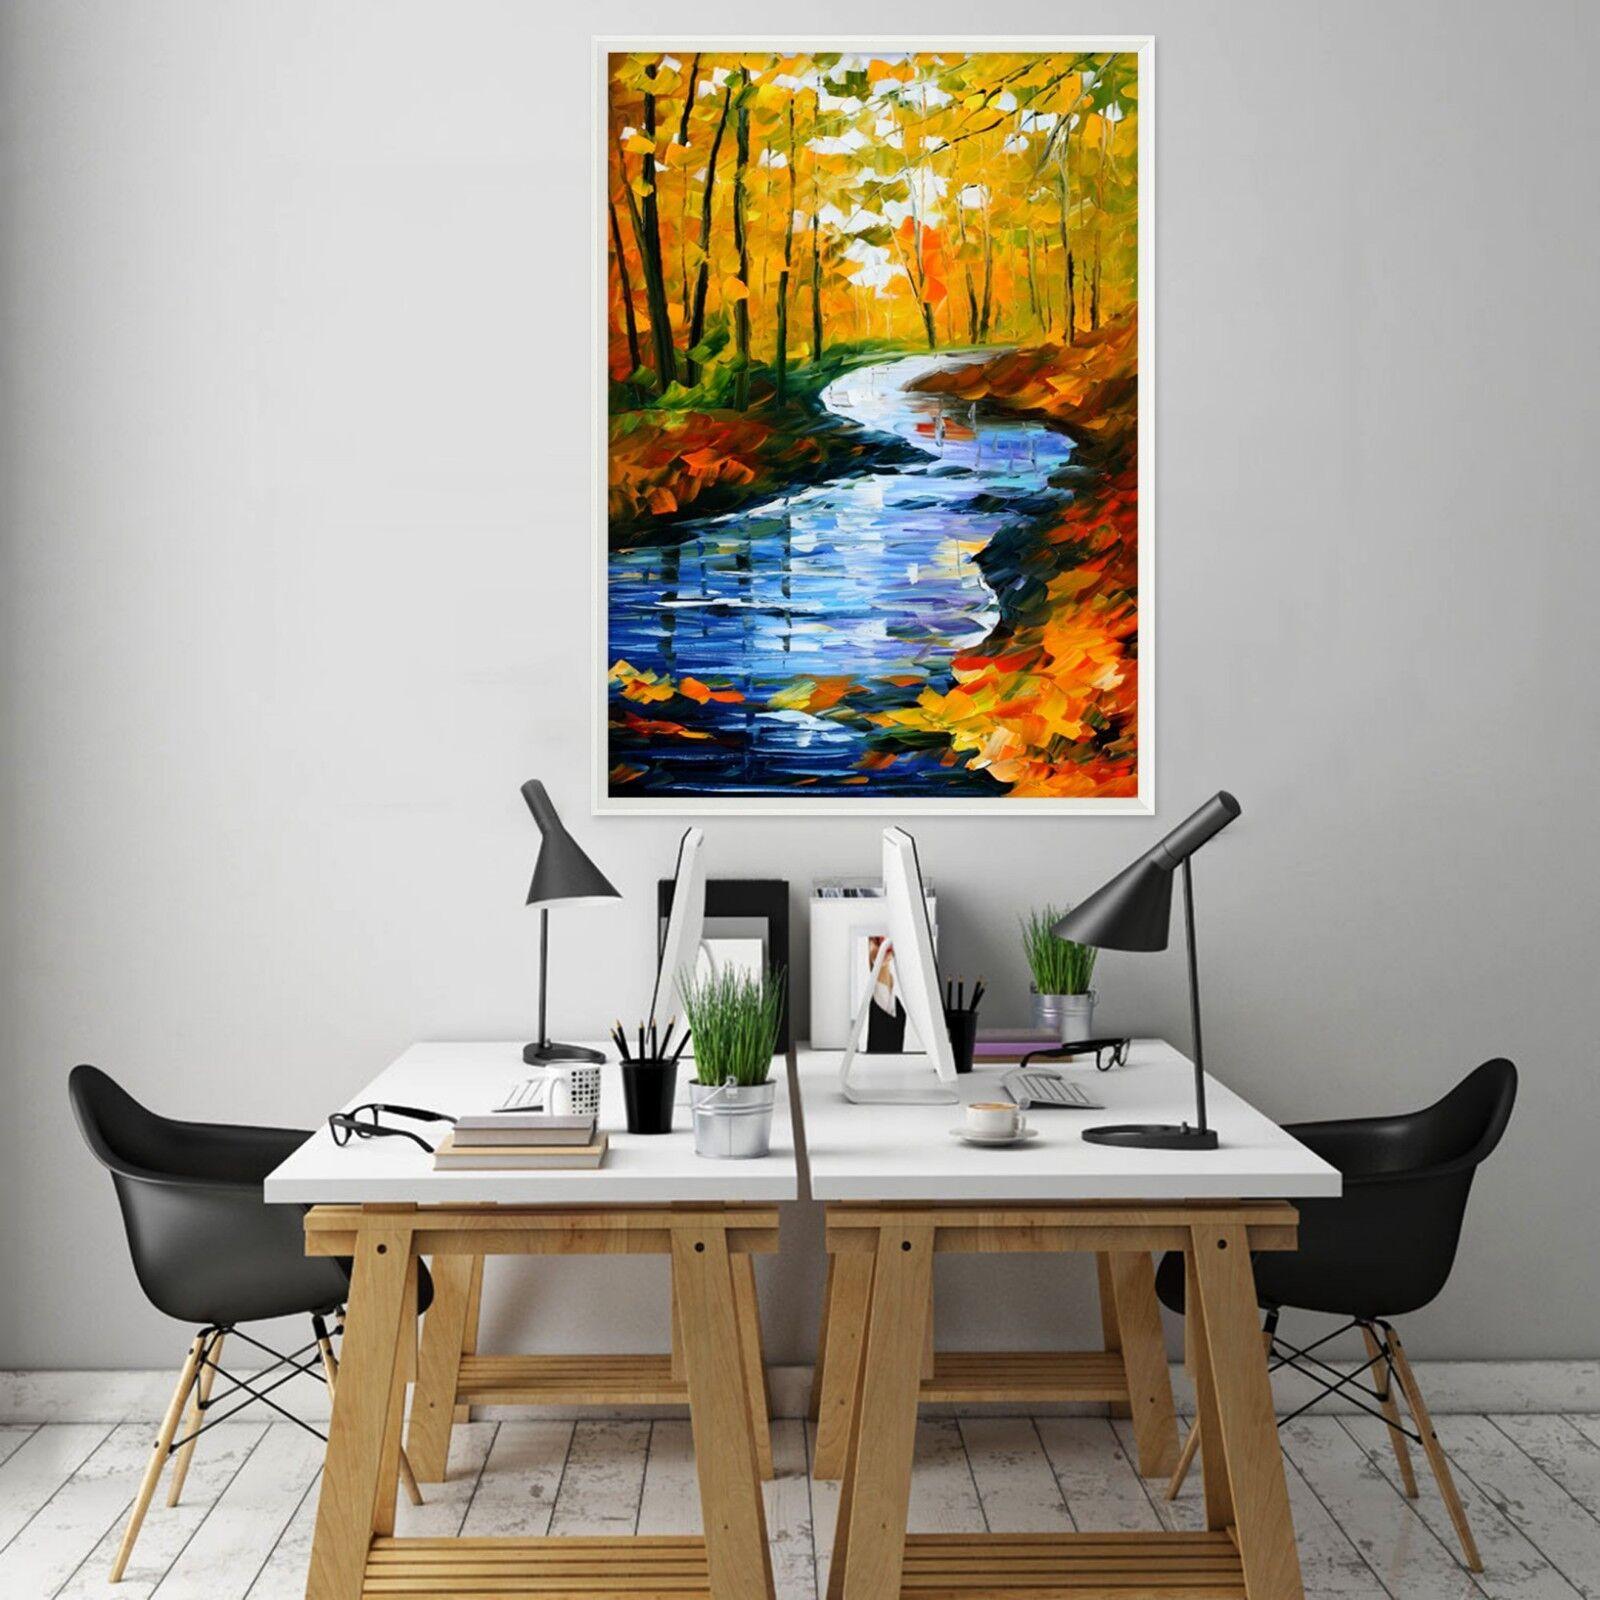 3D Pintura Bosque Creek 2 Póster Enmarcado Decoración del Hogar Pintura de Impresión Arte Wallpaper